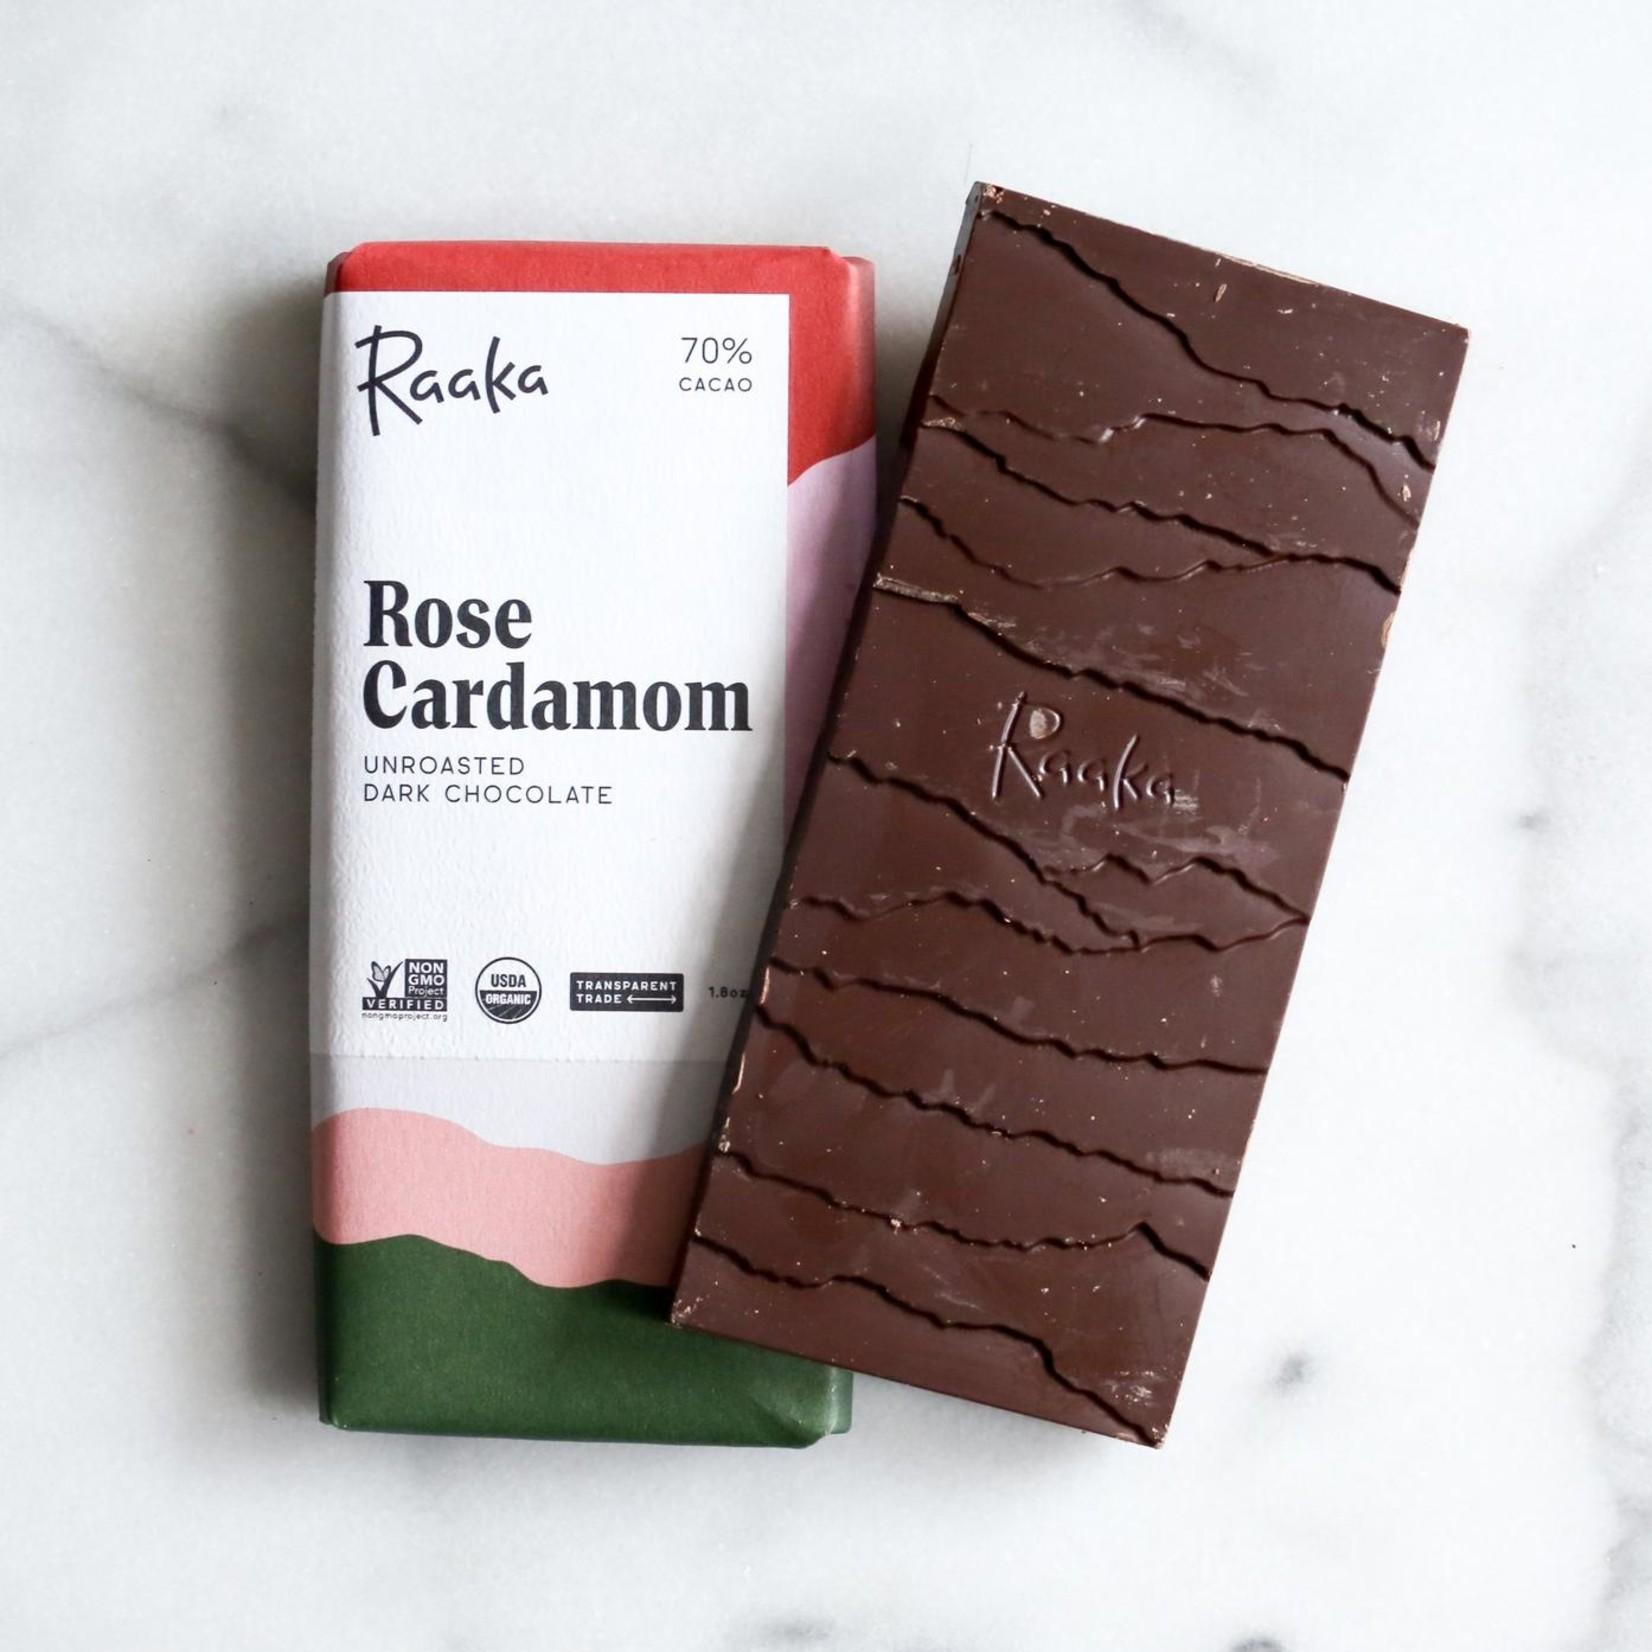 Raaka Rose Cardamom Chocolate Bar